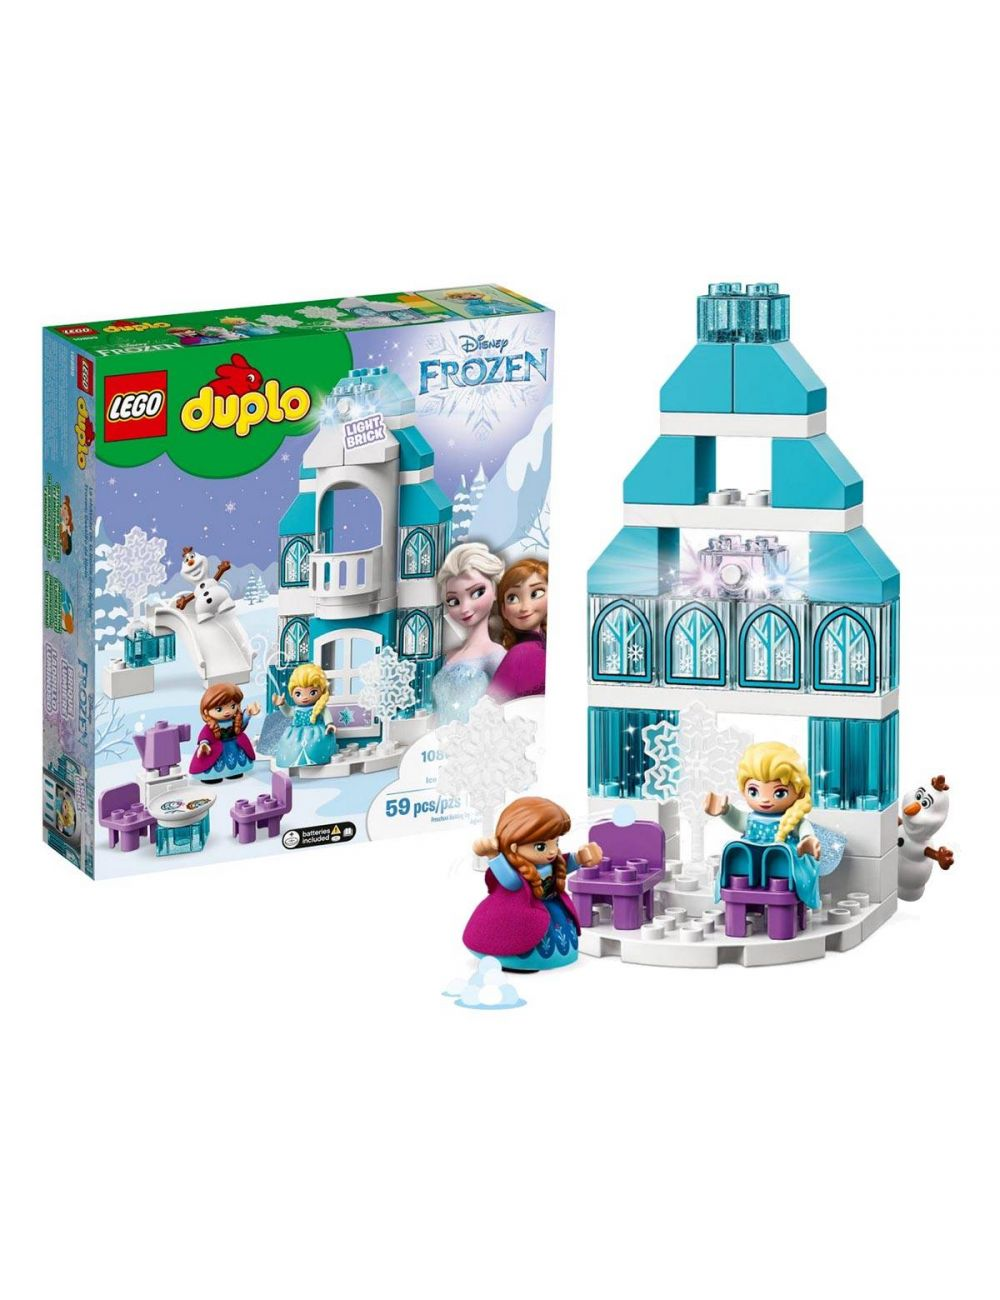 LEGO Duplo Zamek z Krainy Lodu Frozen 10899